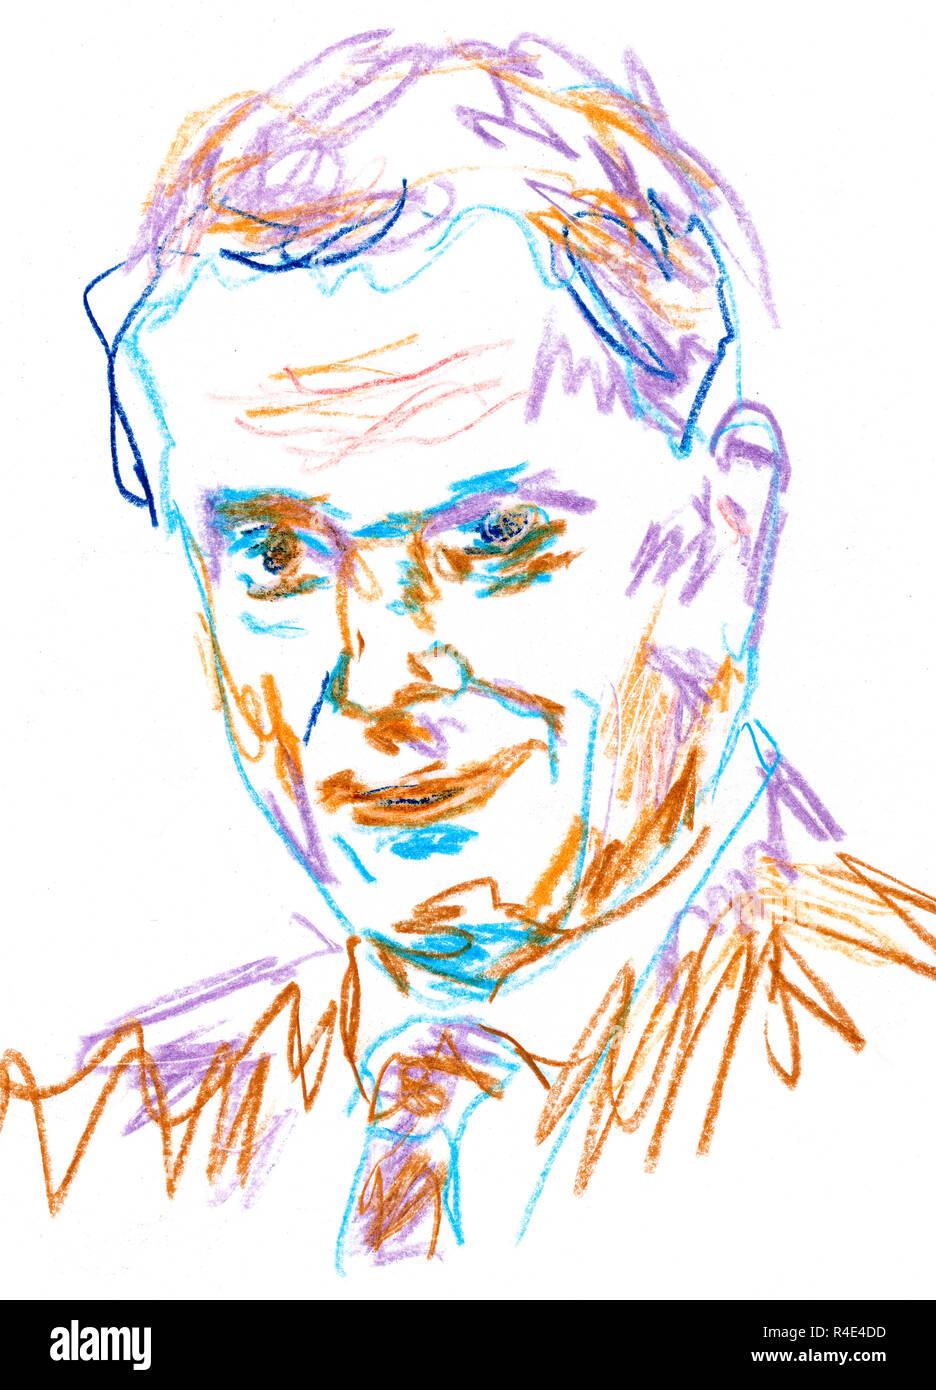 President of Finland Sauli Niinistö - Stock Image